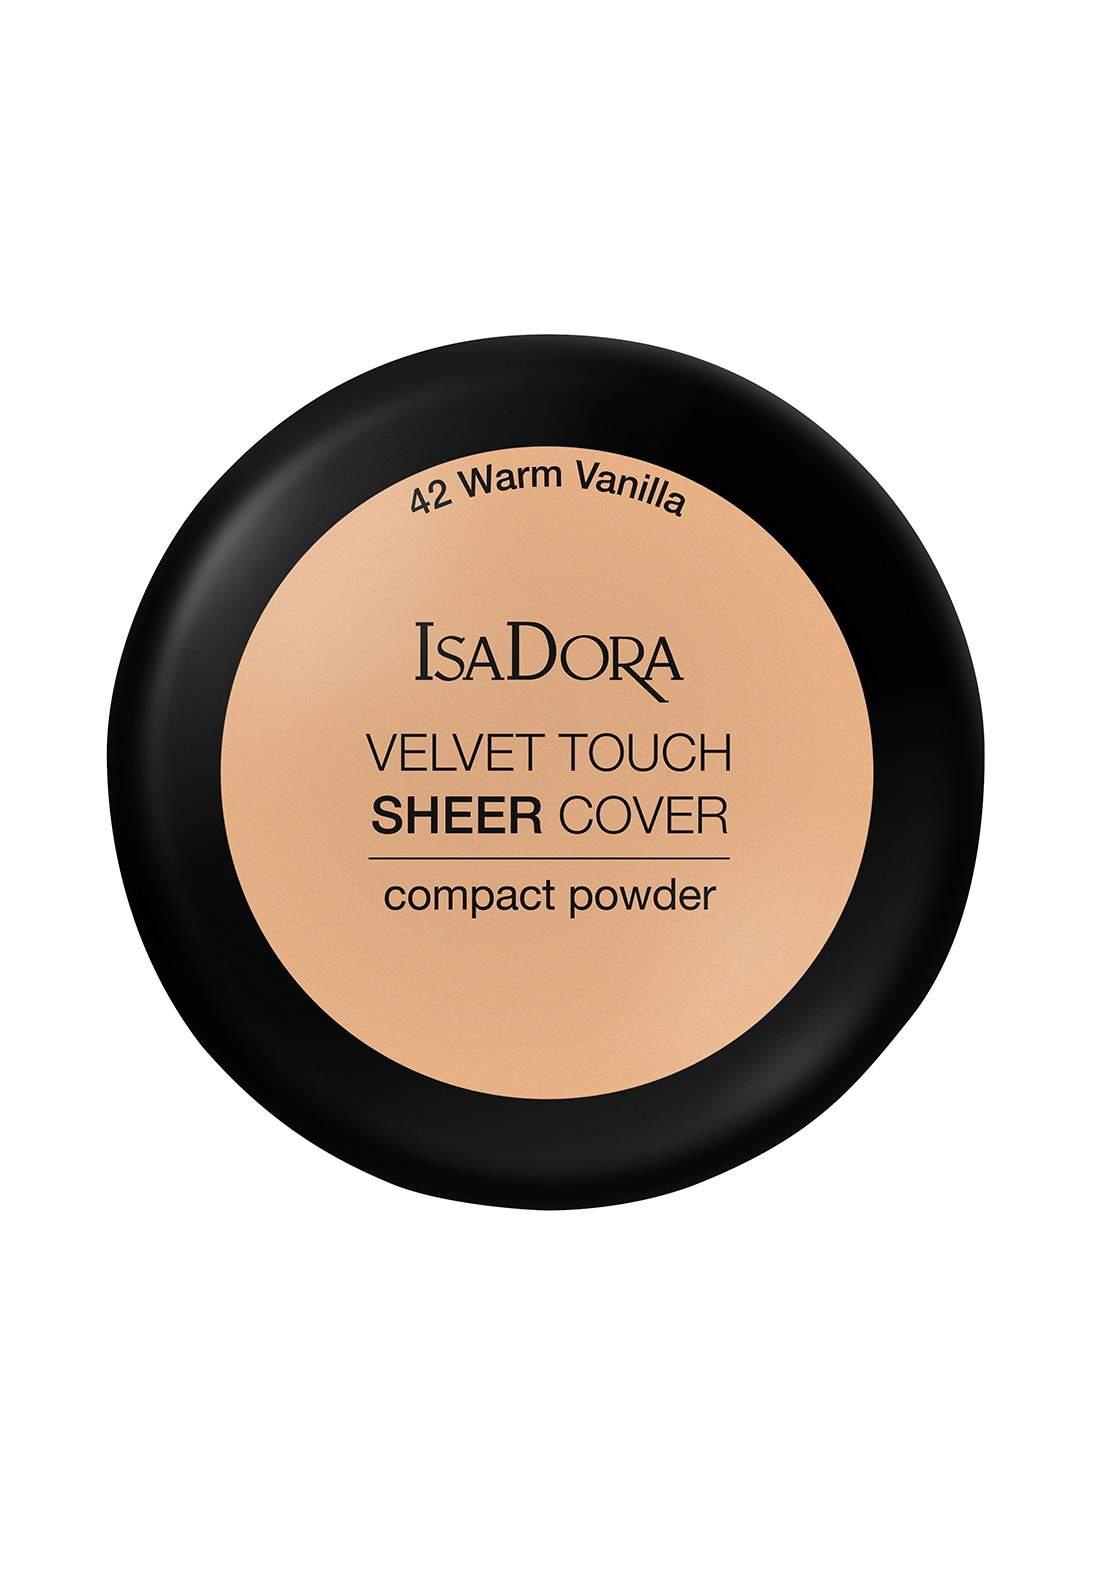 IsaDora 317108 Velvet Touch Sheer Cover Compact Powder Warm Vanilla NO.42 بودرة